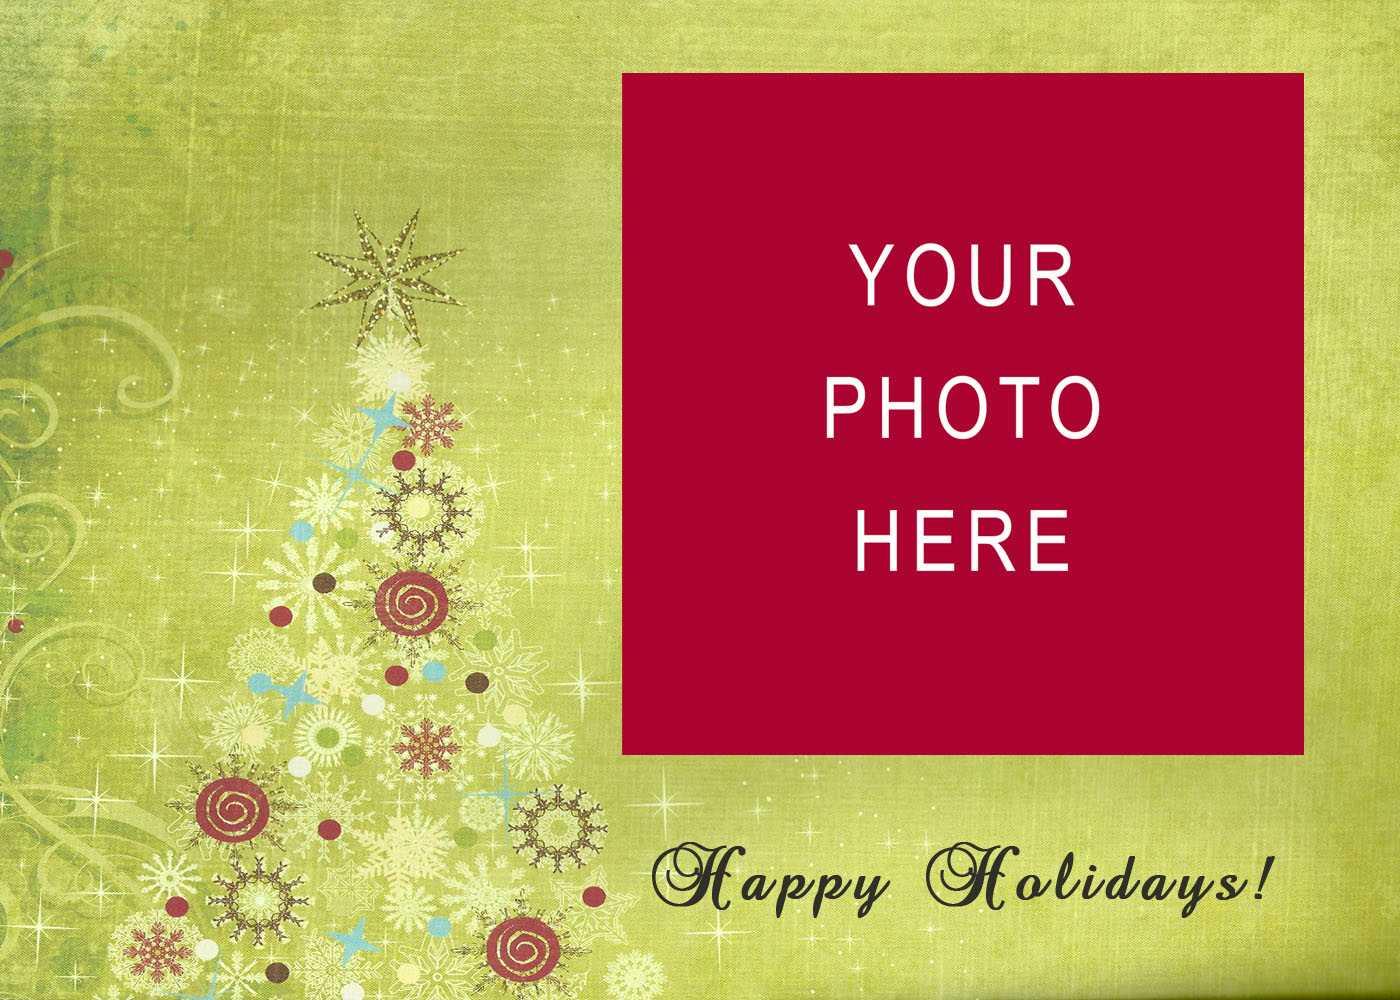 Holiday Card Templates | Madinbelgrade with regard to Free Holiday Photo Card Templates